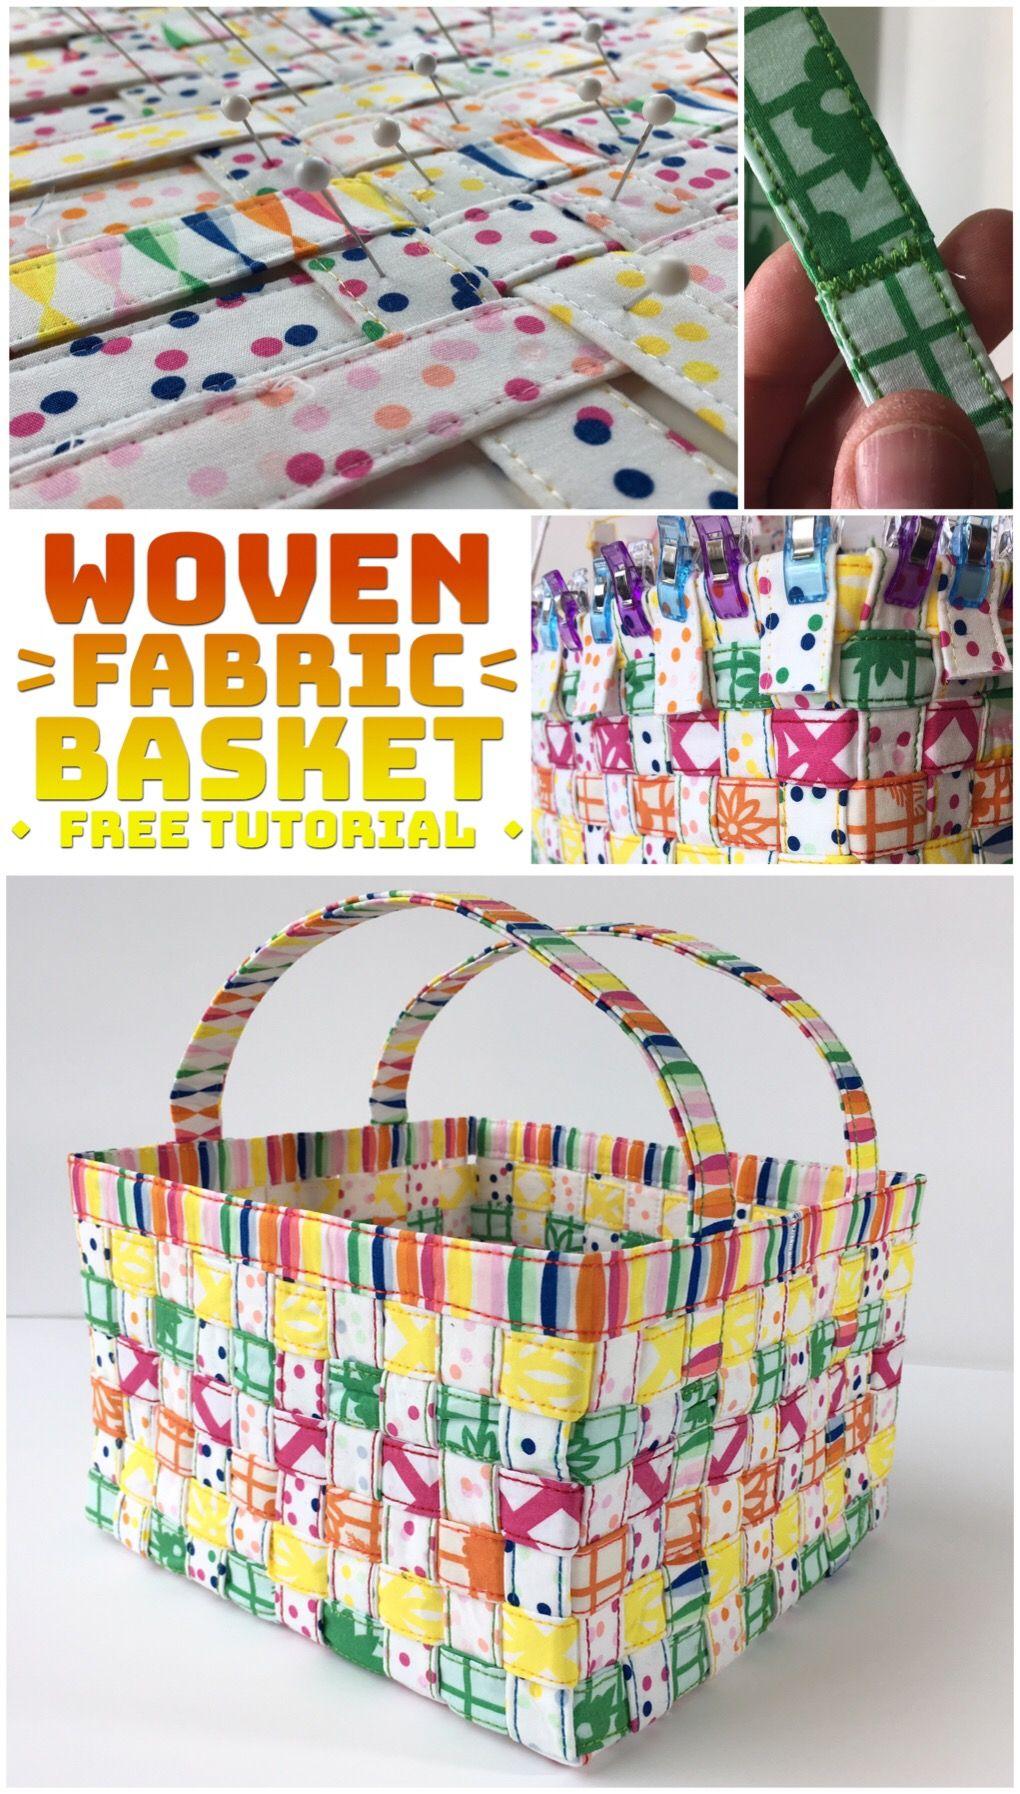 Woven Fabric Basket Tutorial | Ostern, Handarbeiten und Nähen